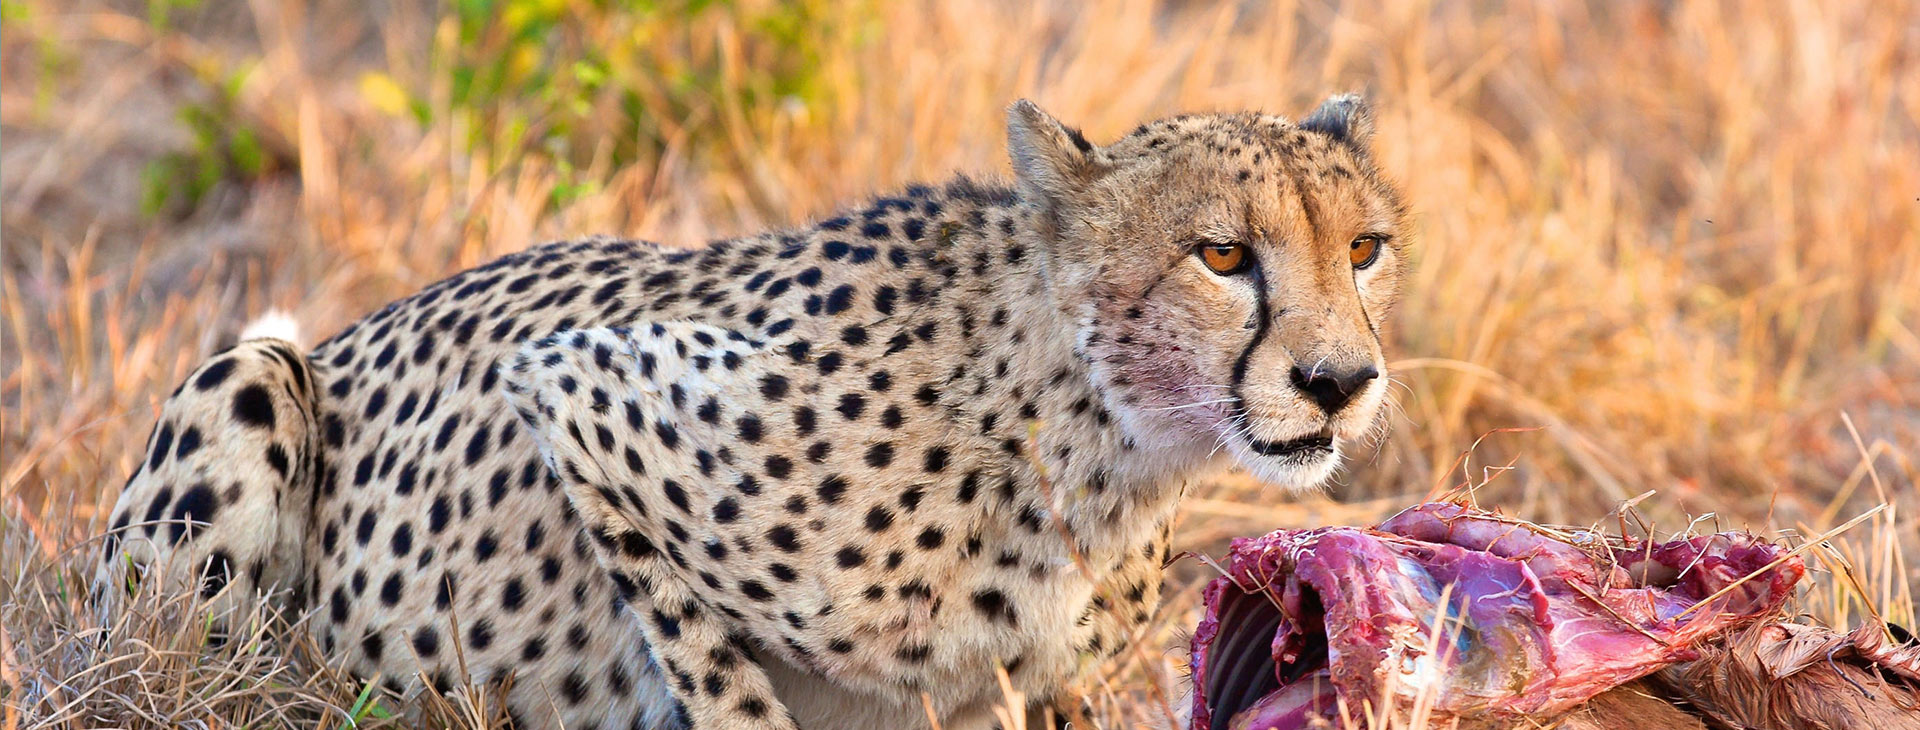 Halal Friendly Safari